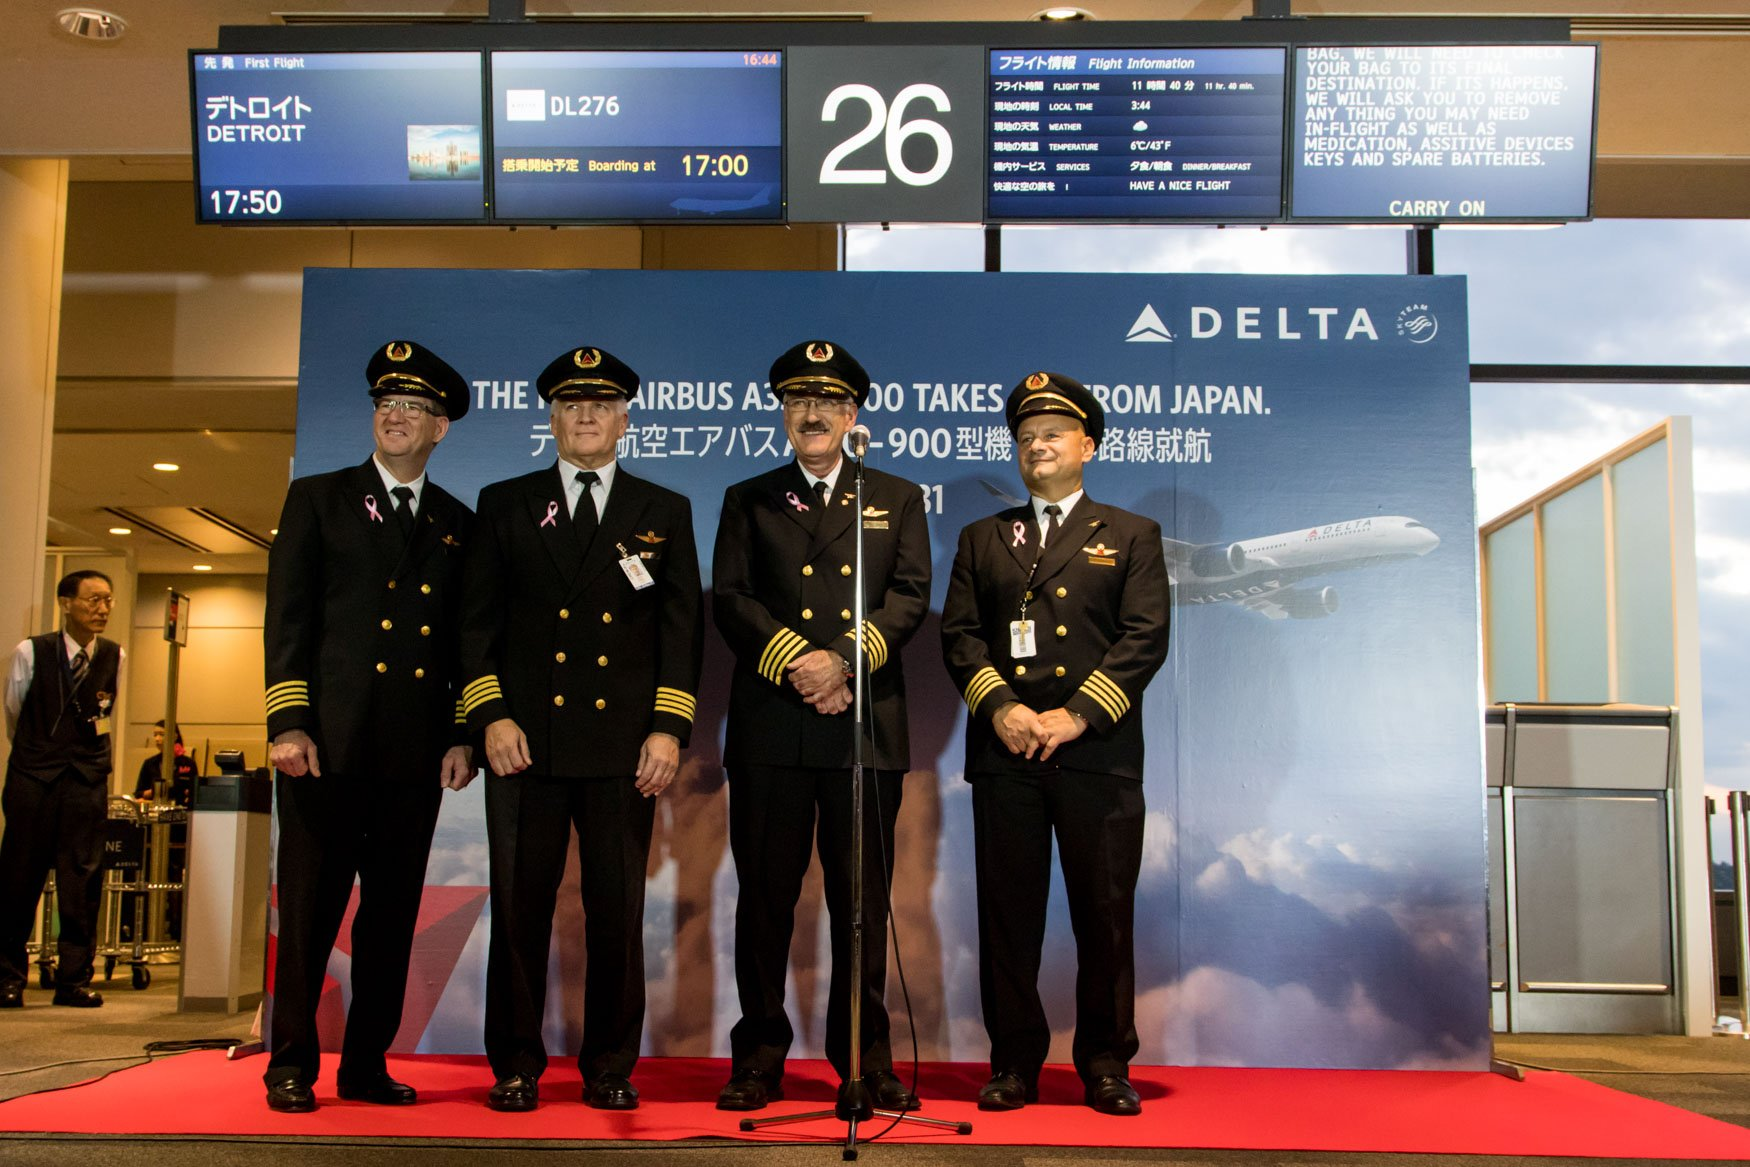 Pilots of the Flight